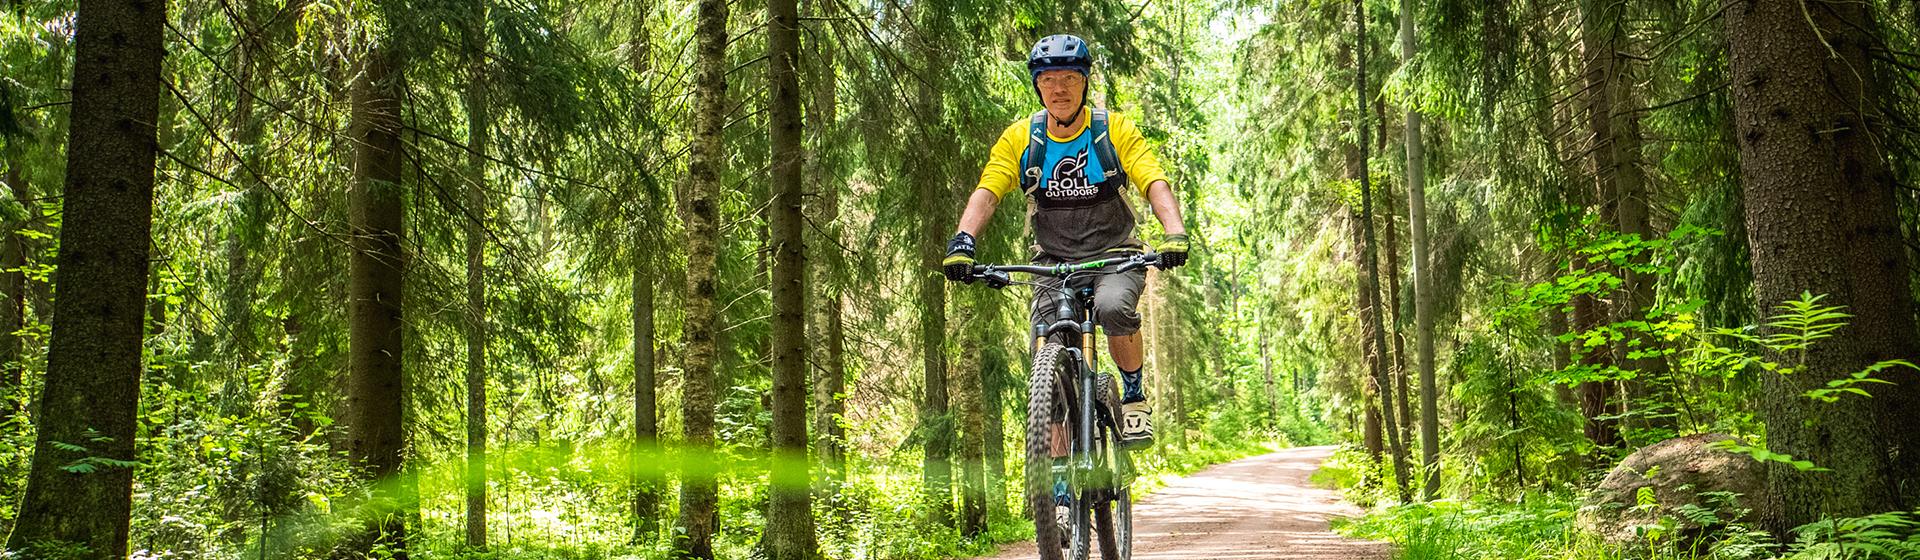 rent a mountain bike helsinki central park